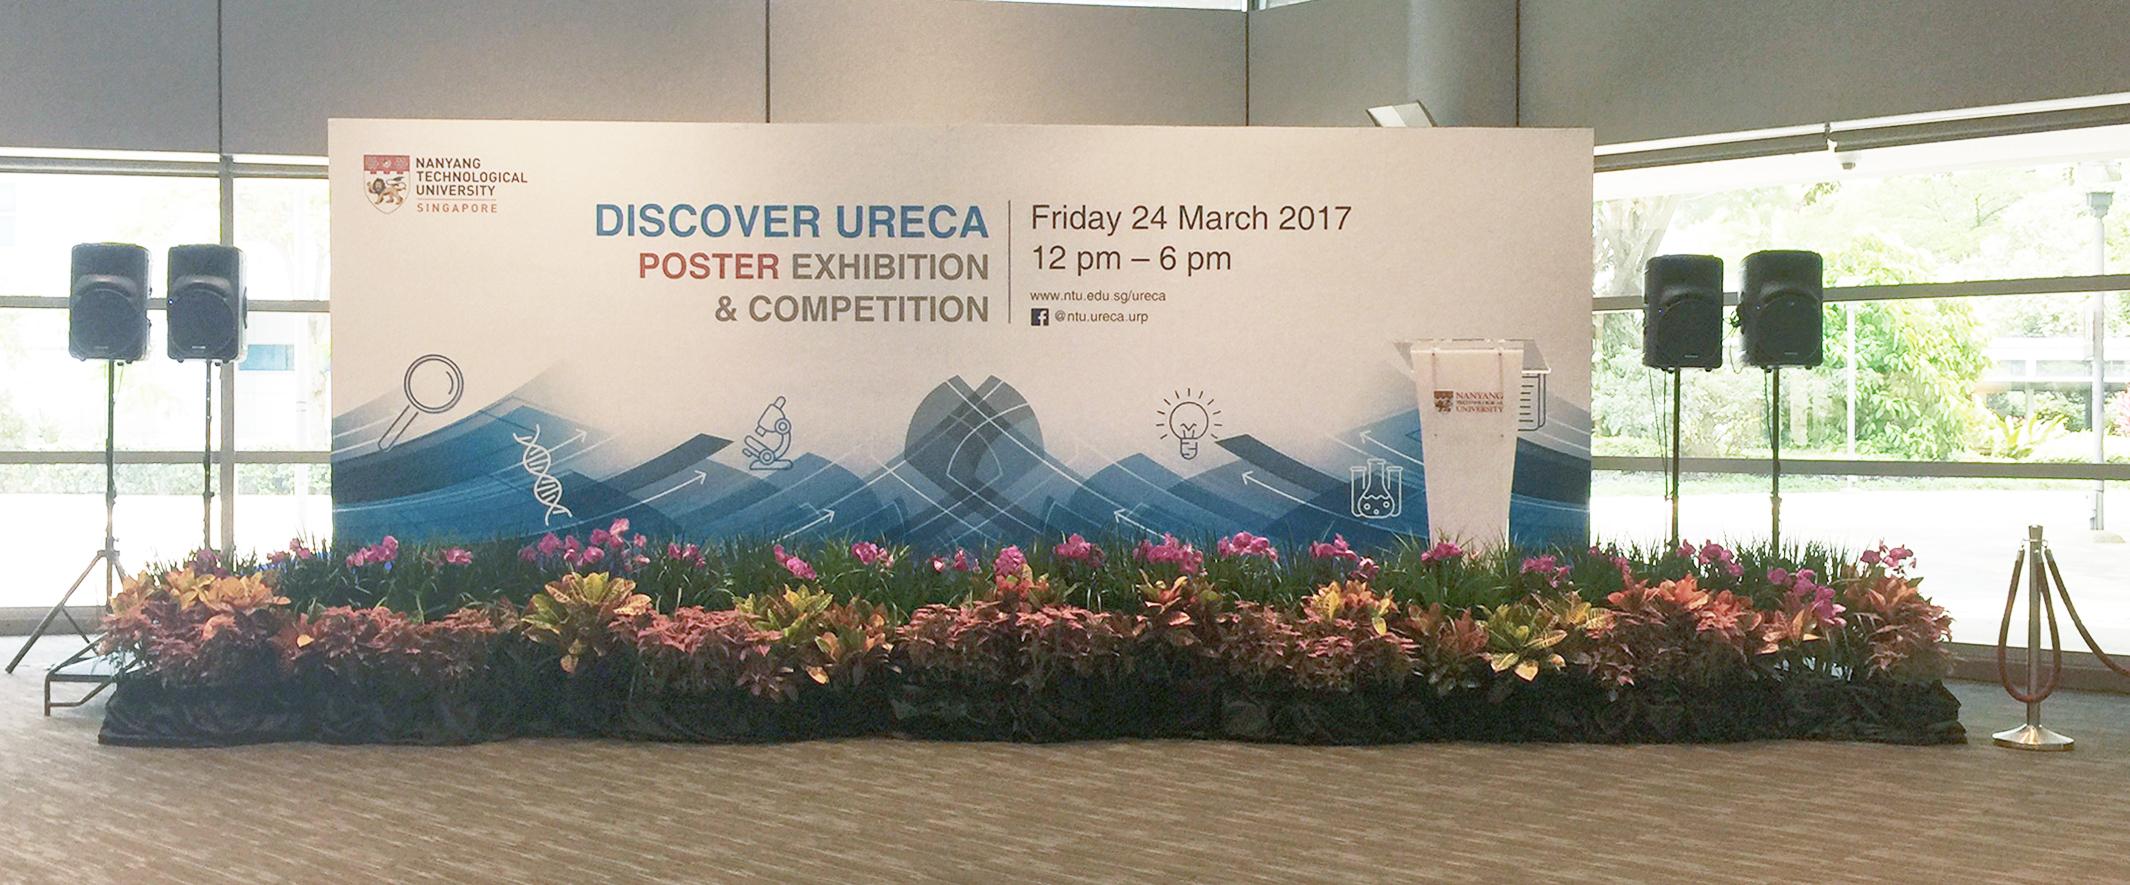 NTU Discover ureca poster exhibition-sta